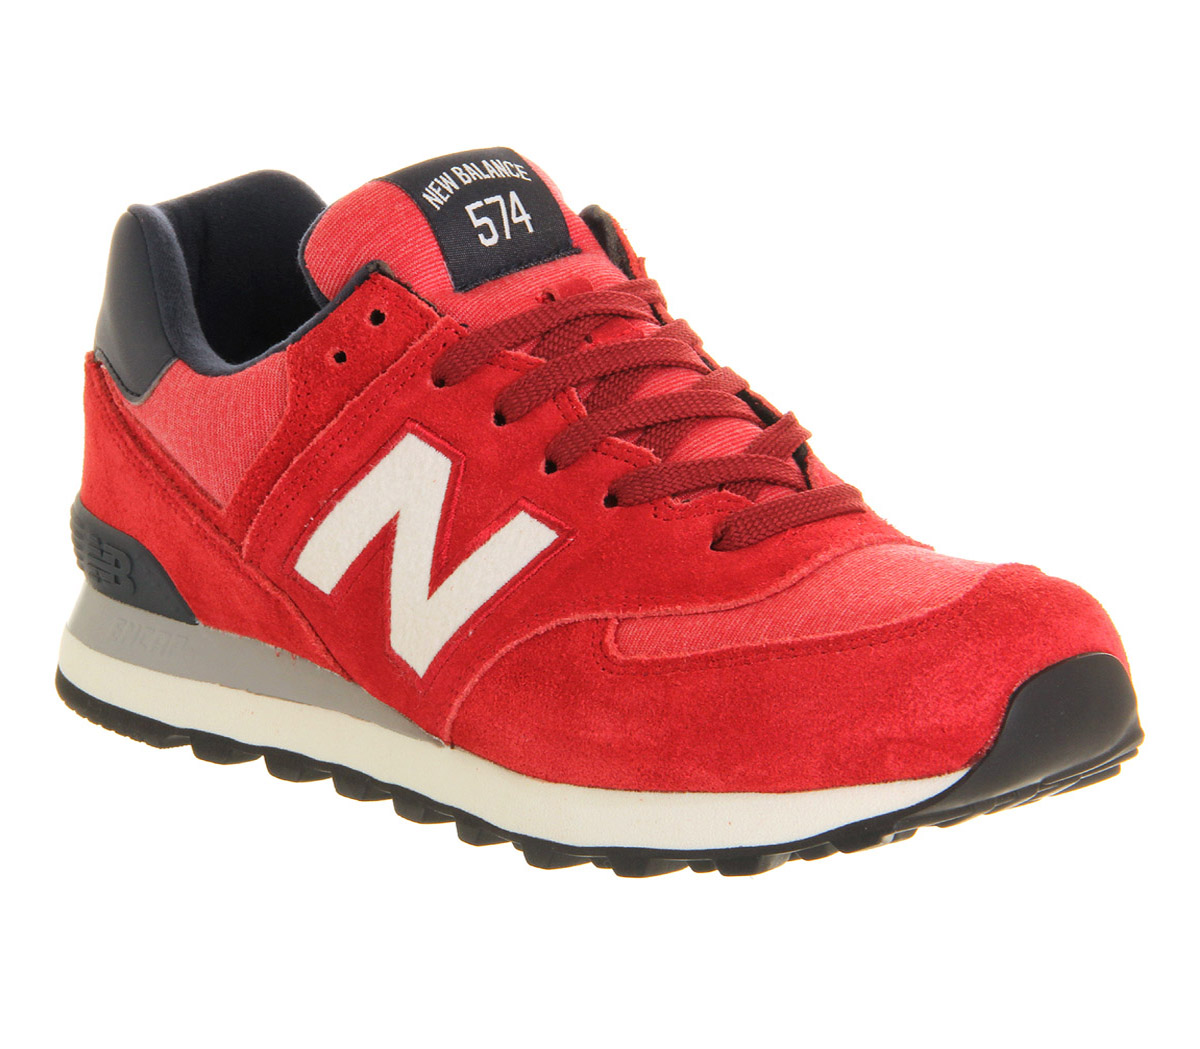 office shoes dublin. NB1 Office Shoes Dublin